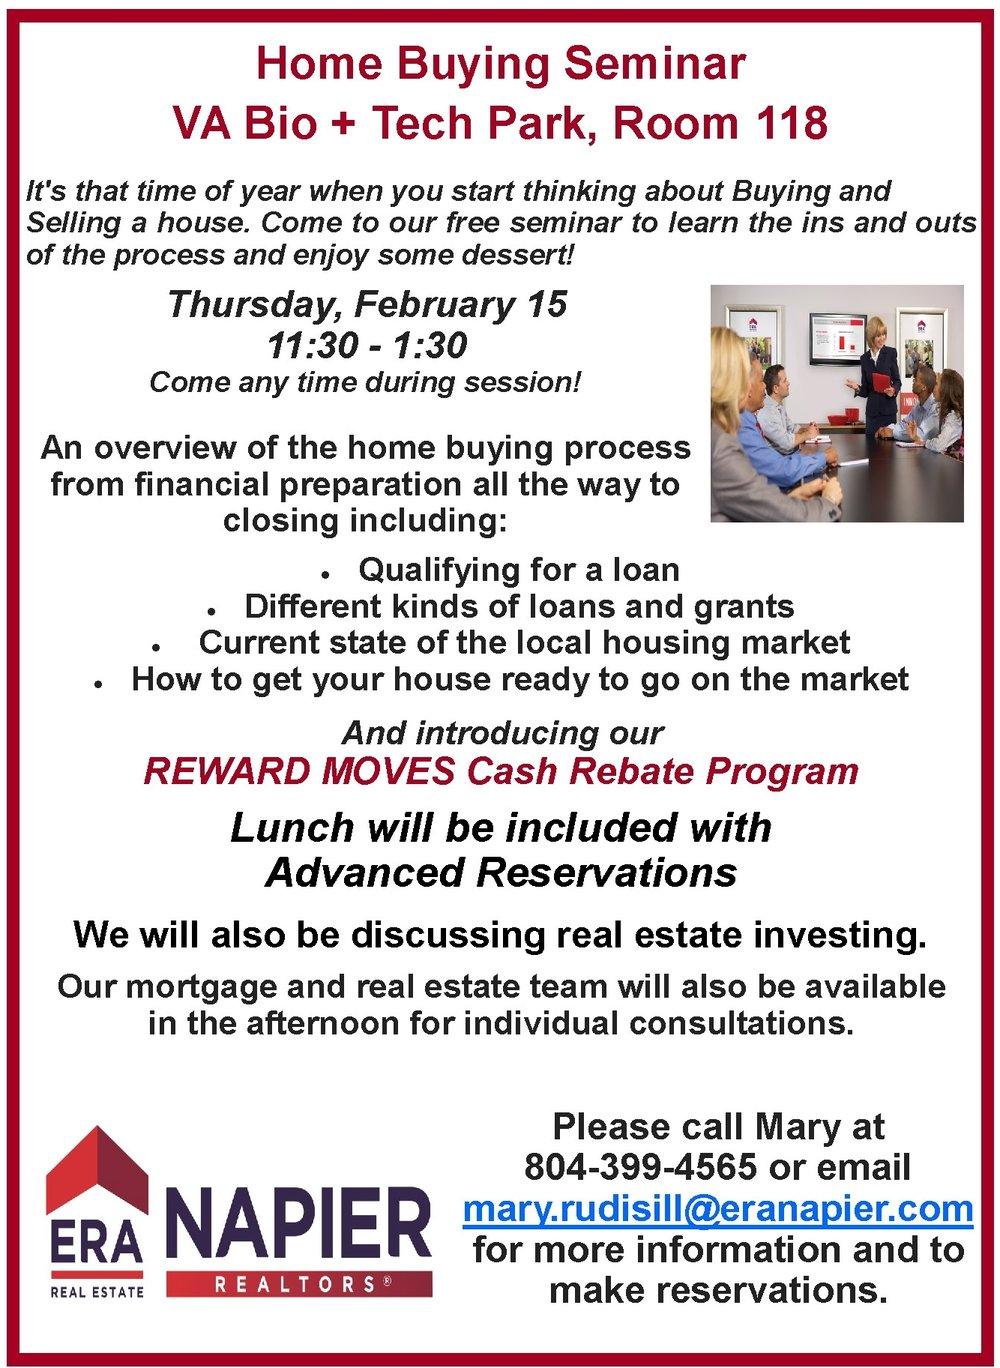 Home Buying Seminar 2-15-18.jpg